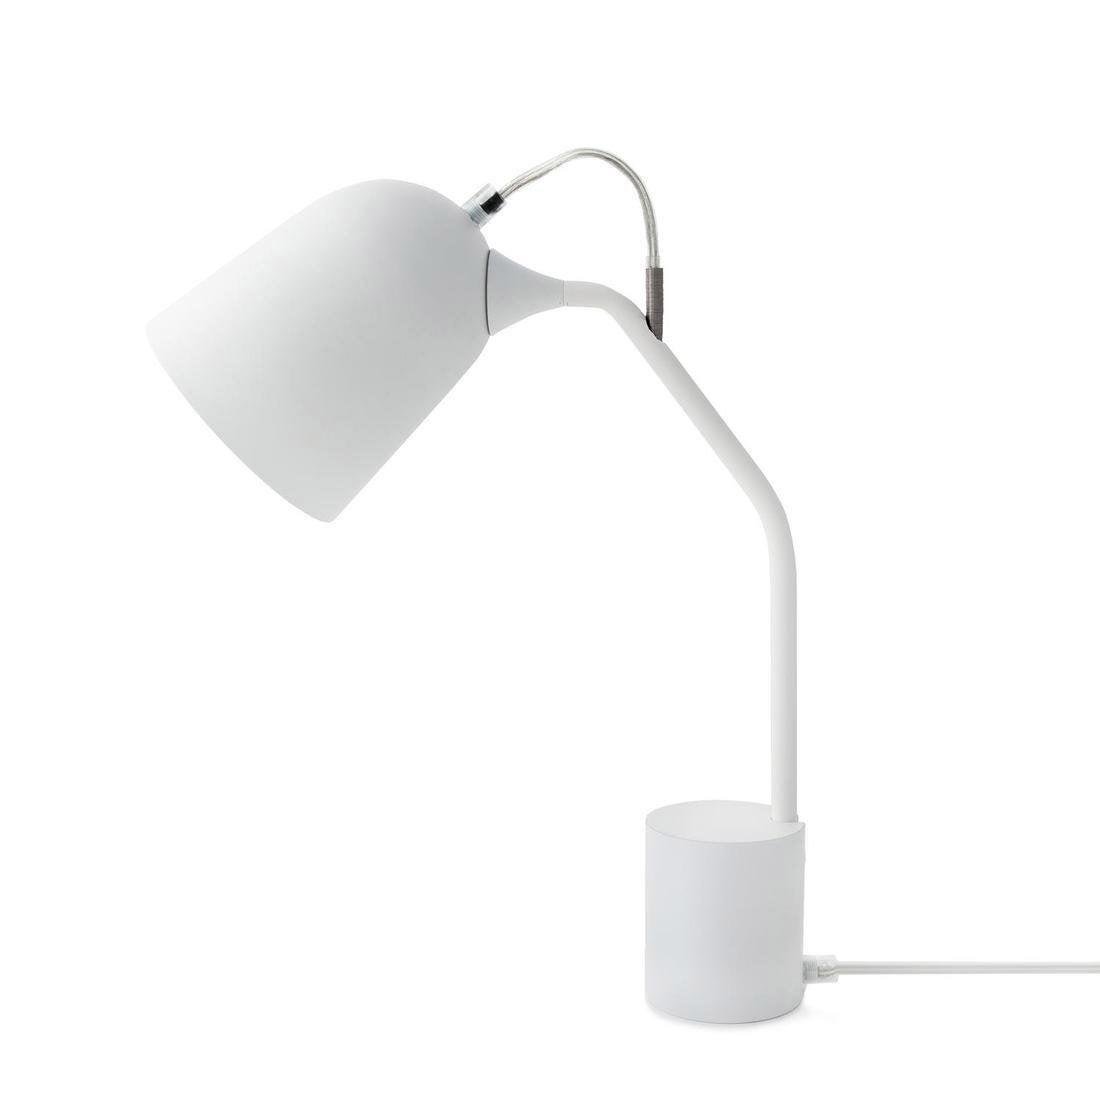 Lampe, design, pvc blanc, LO EDITIONS Magnétic Orientable